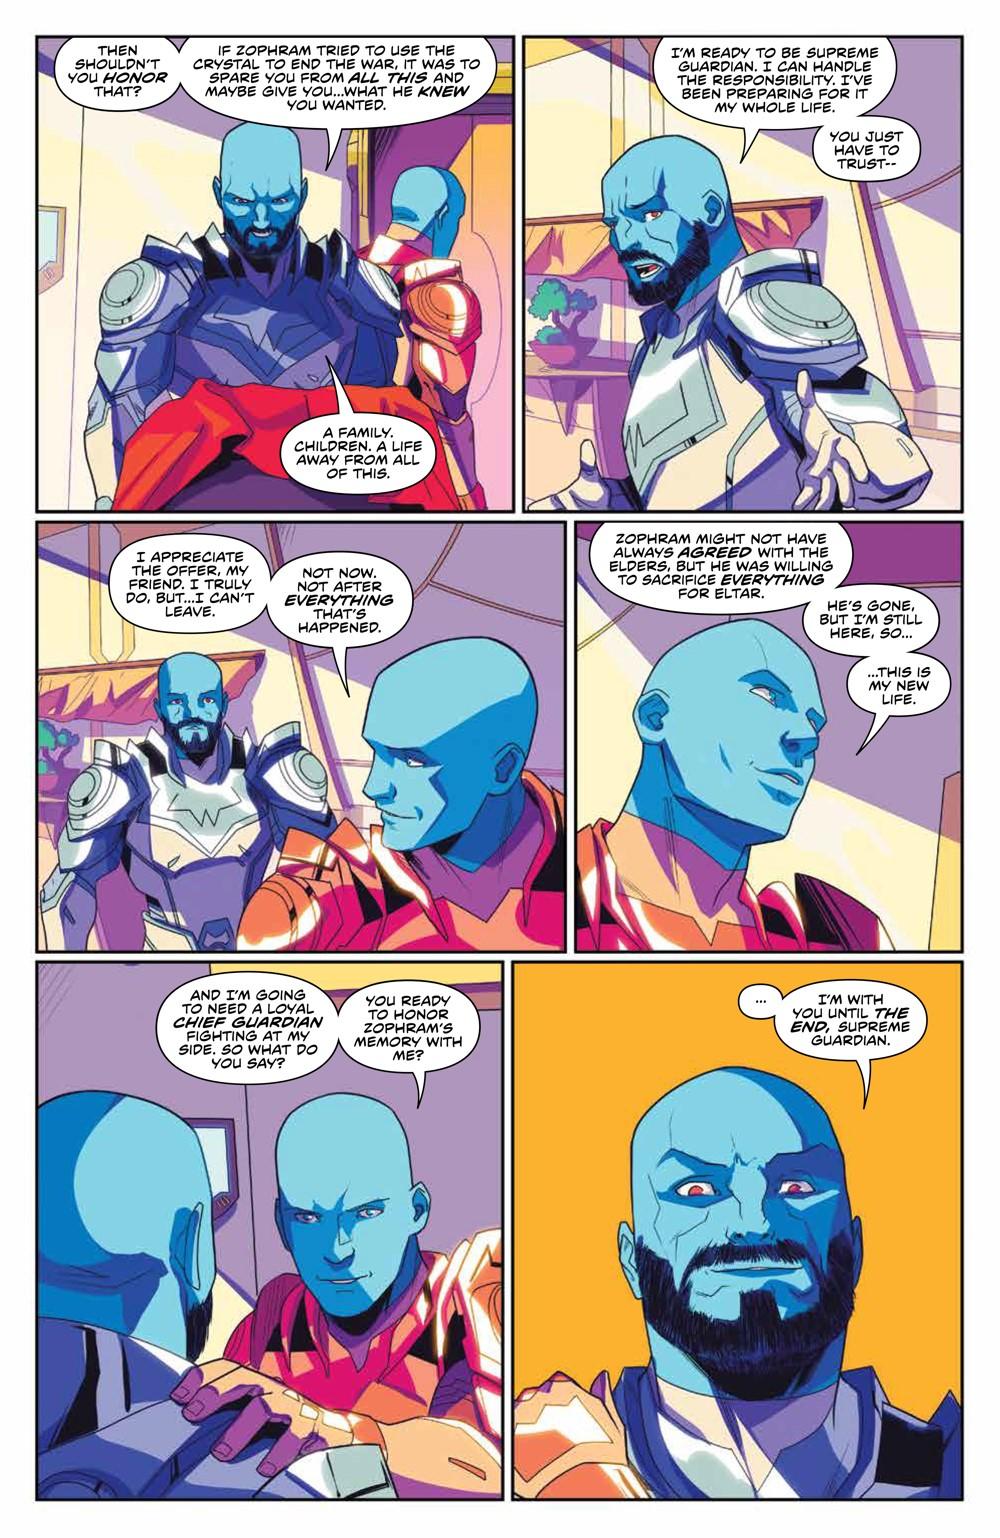 MightyMorphin_012_PRESS_5 ComicList Previews: MIGHTY MORPHIN #12